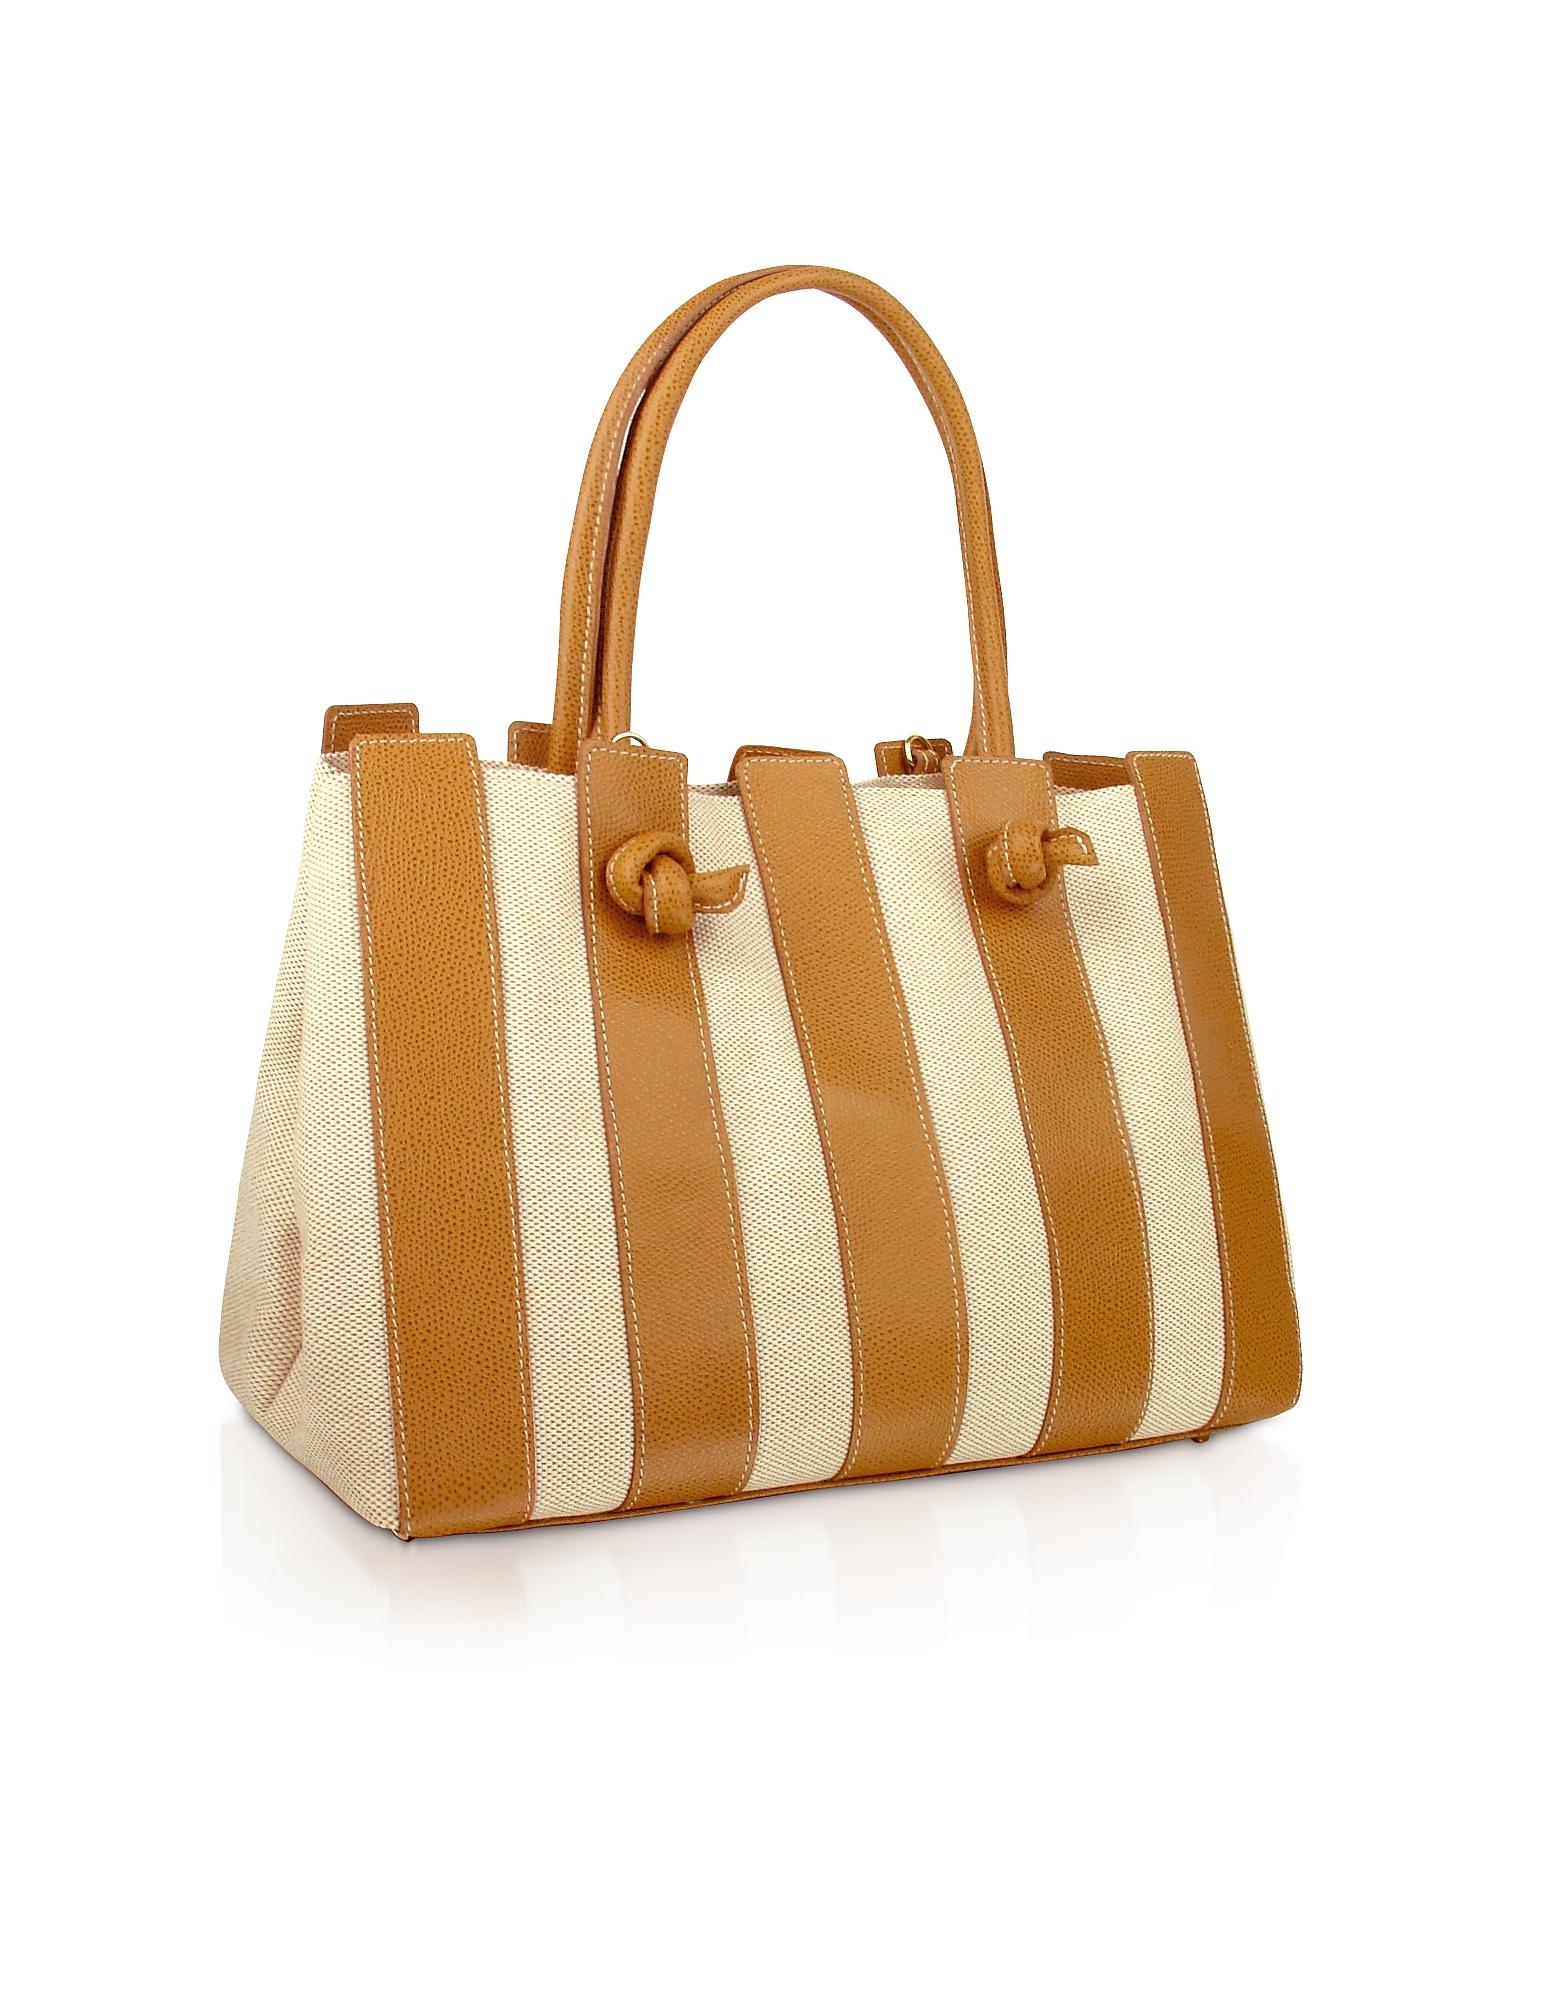 Fontanelli Designer Handbags, Canvas & Leather Italian Tote Handbag